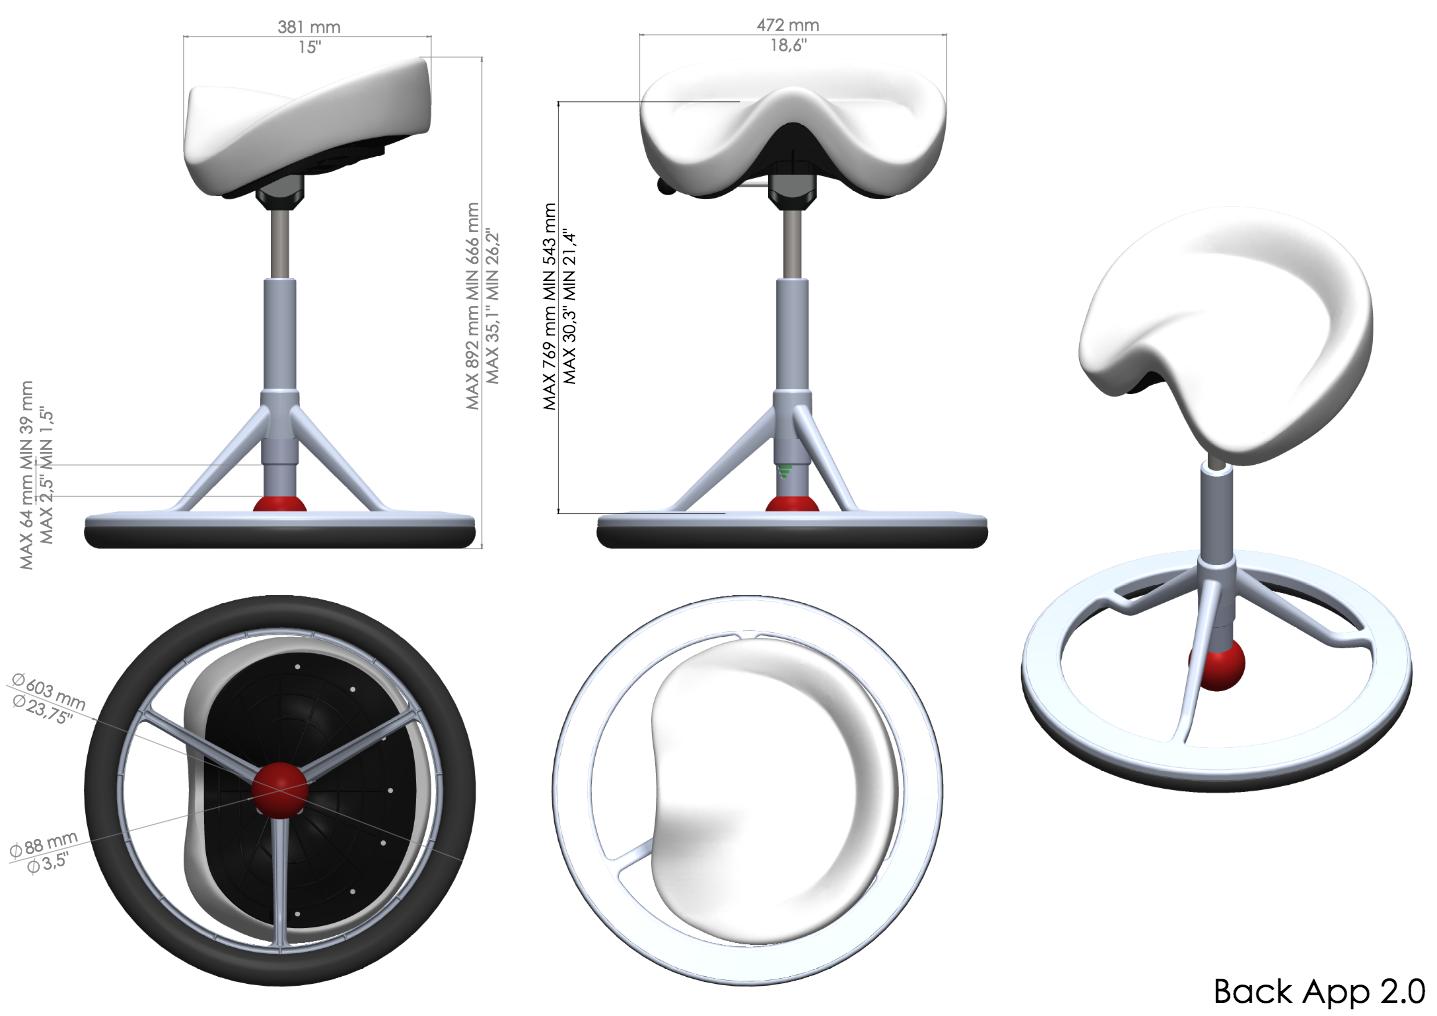 backapp-20-schematics.png